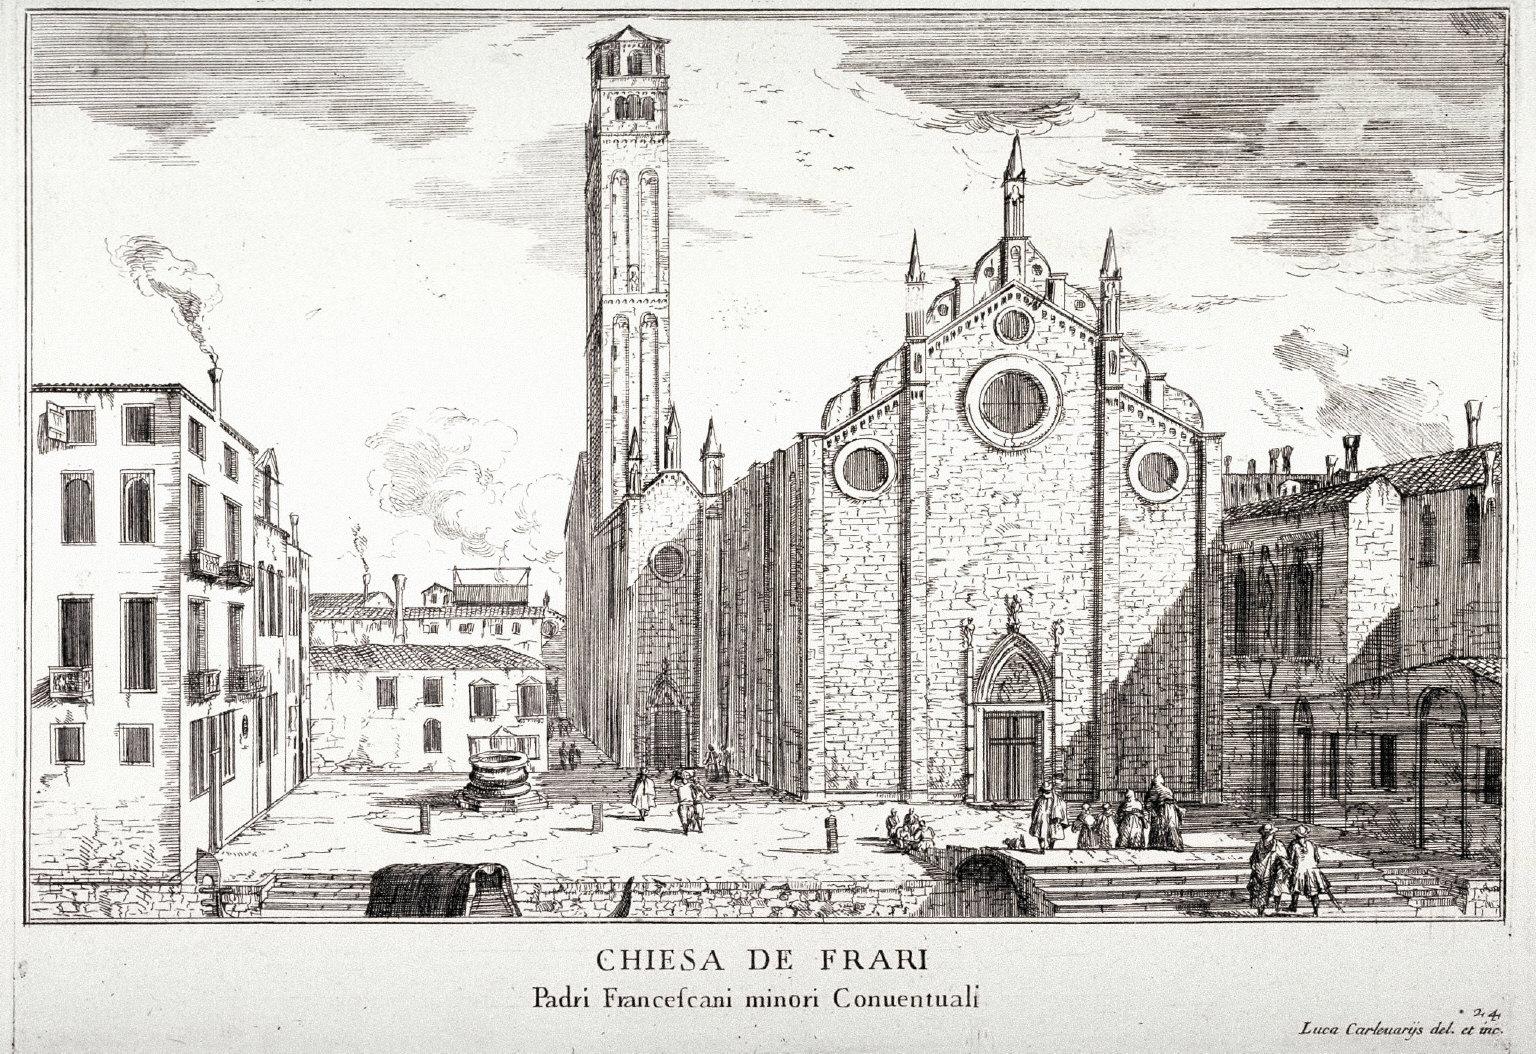 Chiesa de Frari, pl. 24 from the series Le fabriche e vedute di Venetia... (Buildings and Views of Venice)